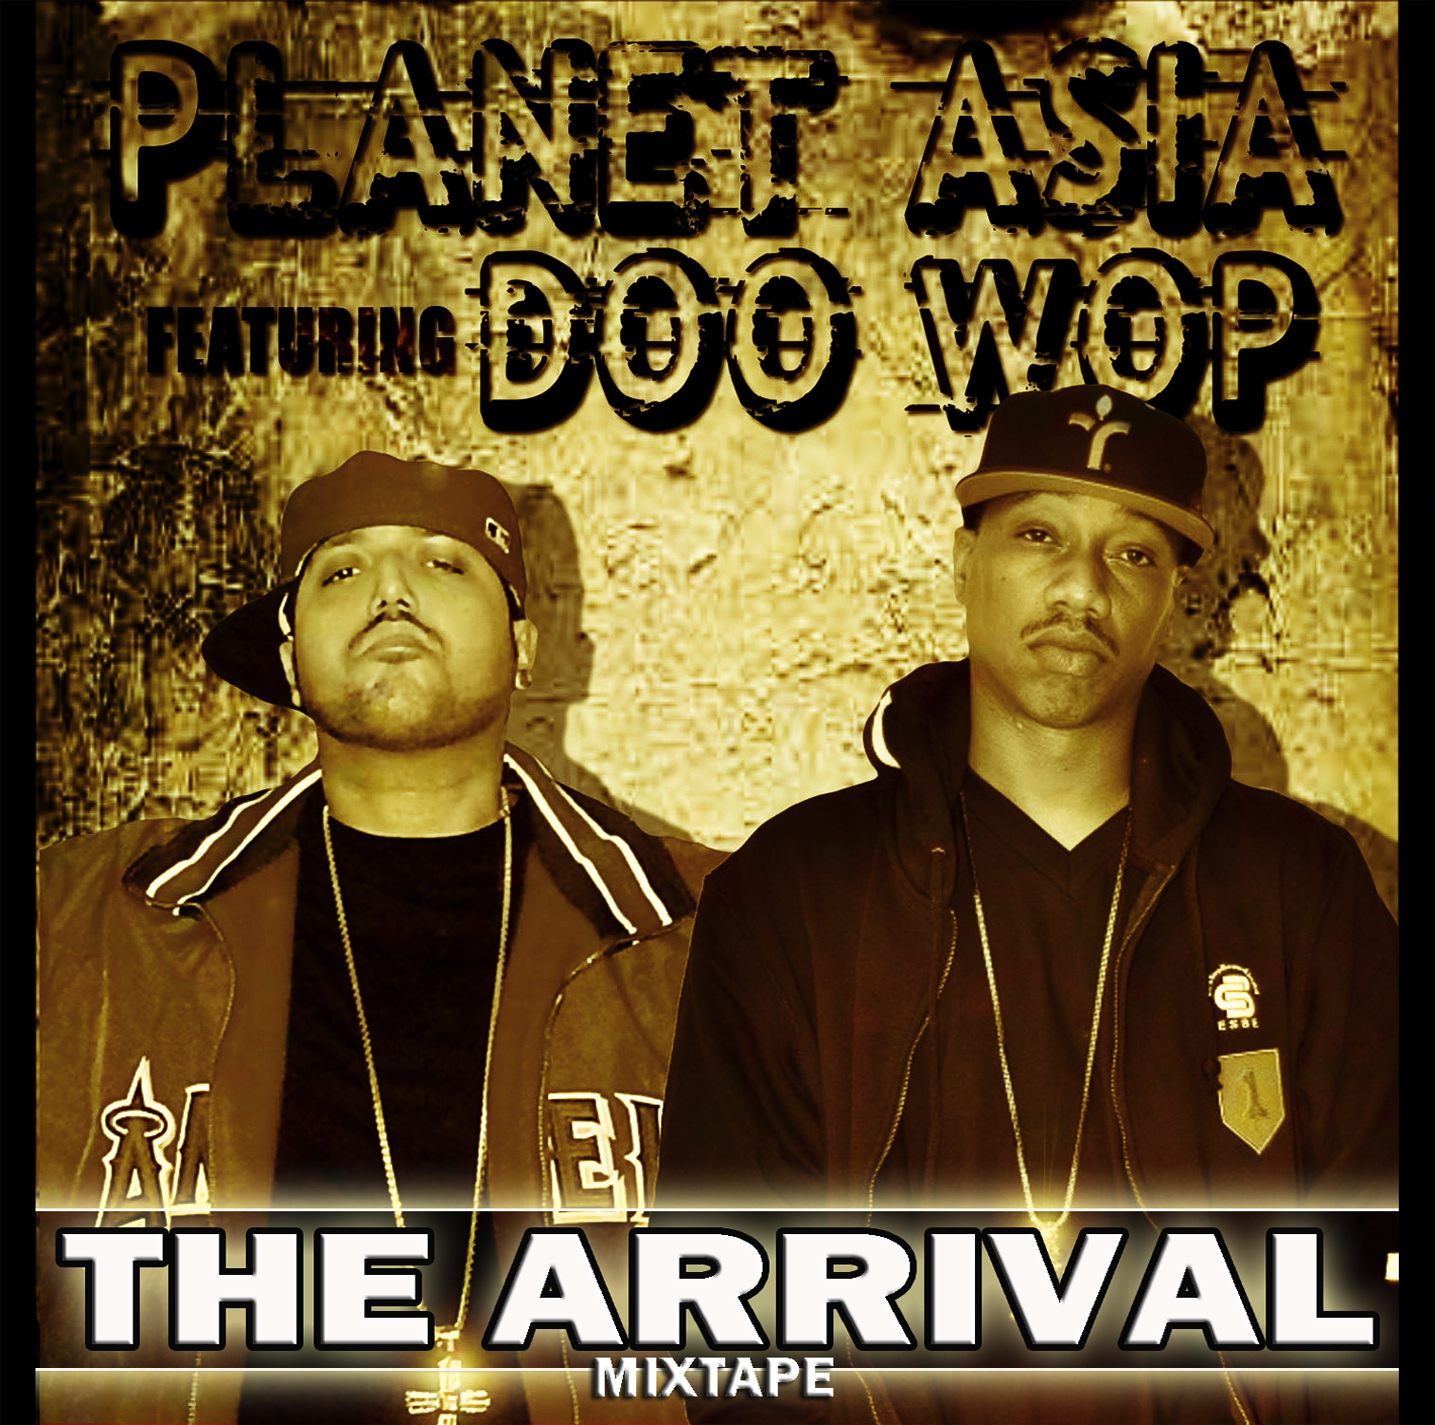 Planet Asia + Doo Wop -